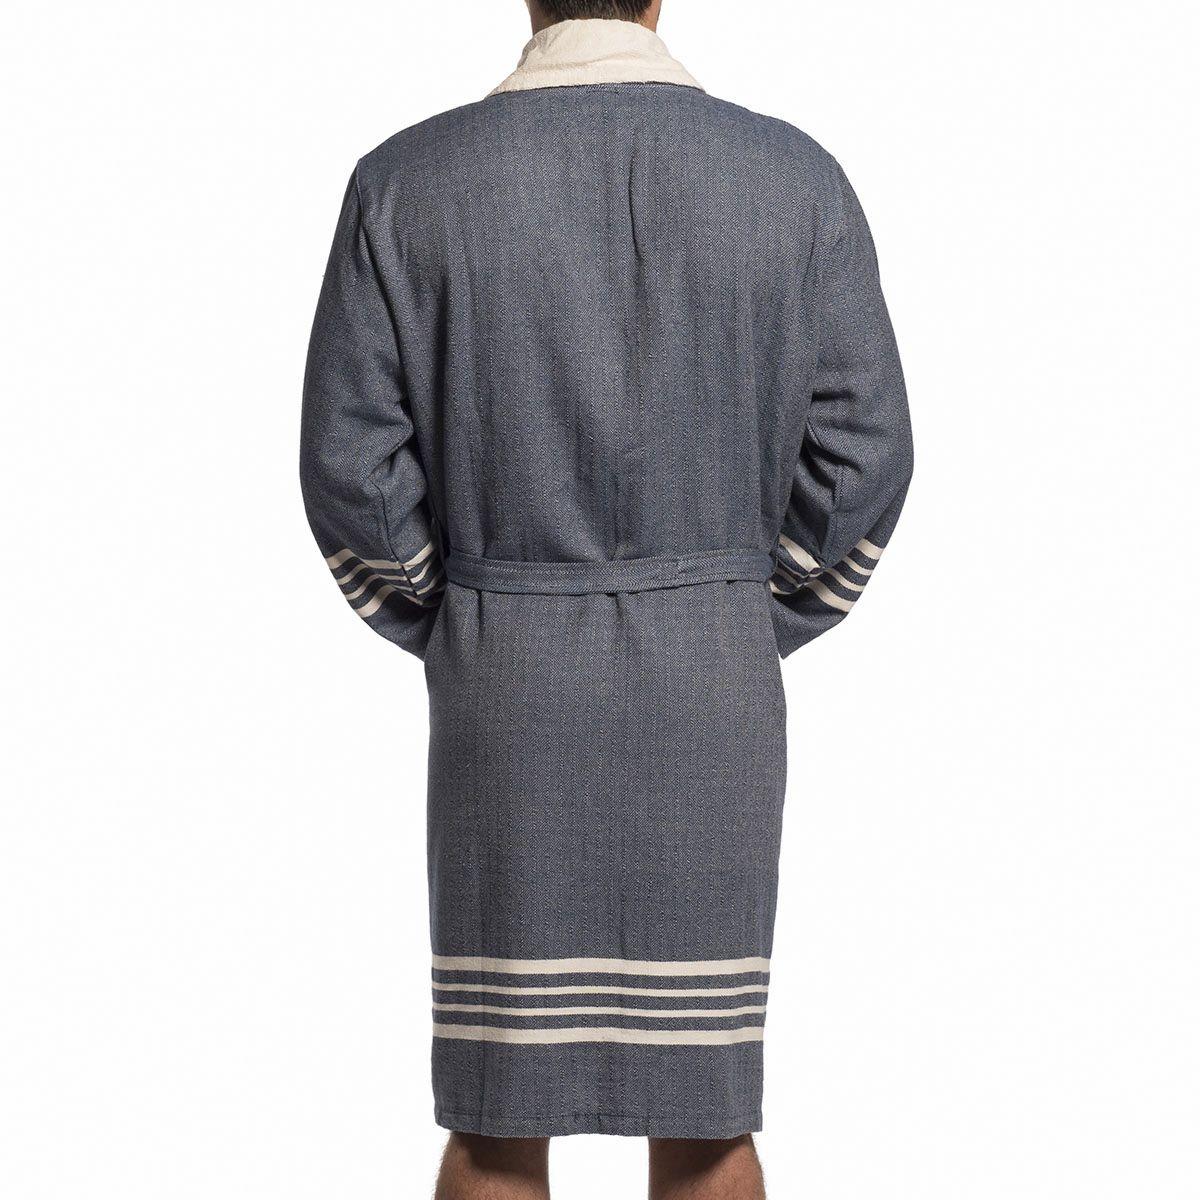 Bathrobe Sultan with towel - Navy